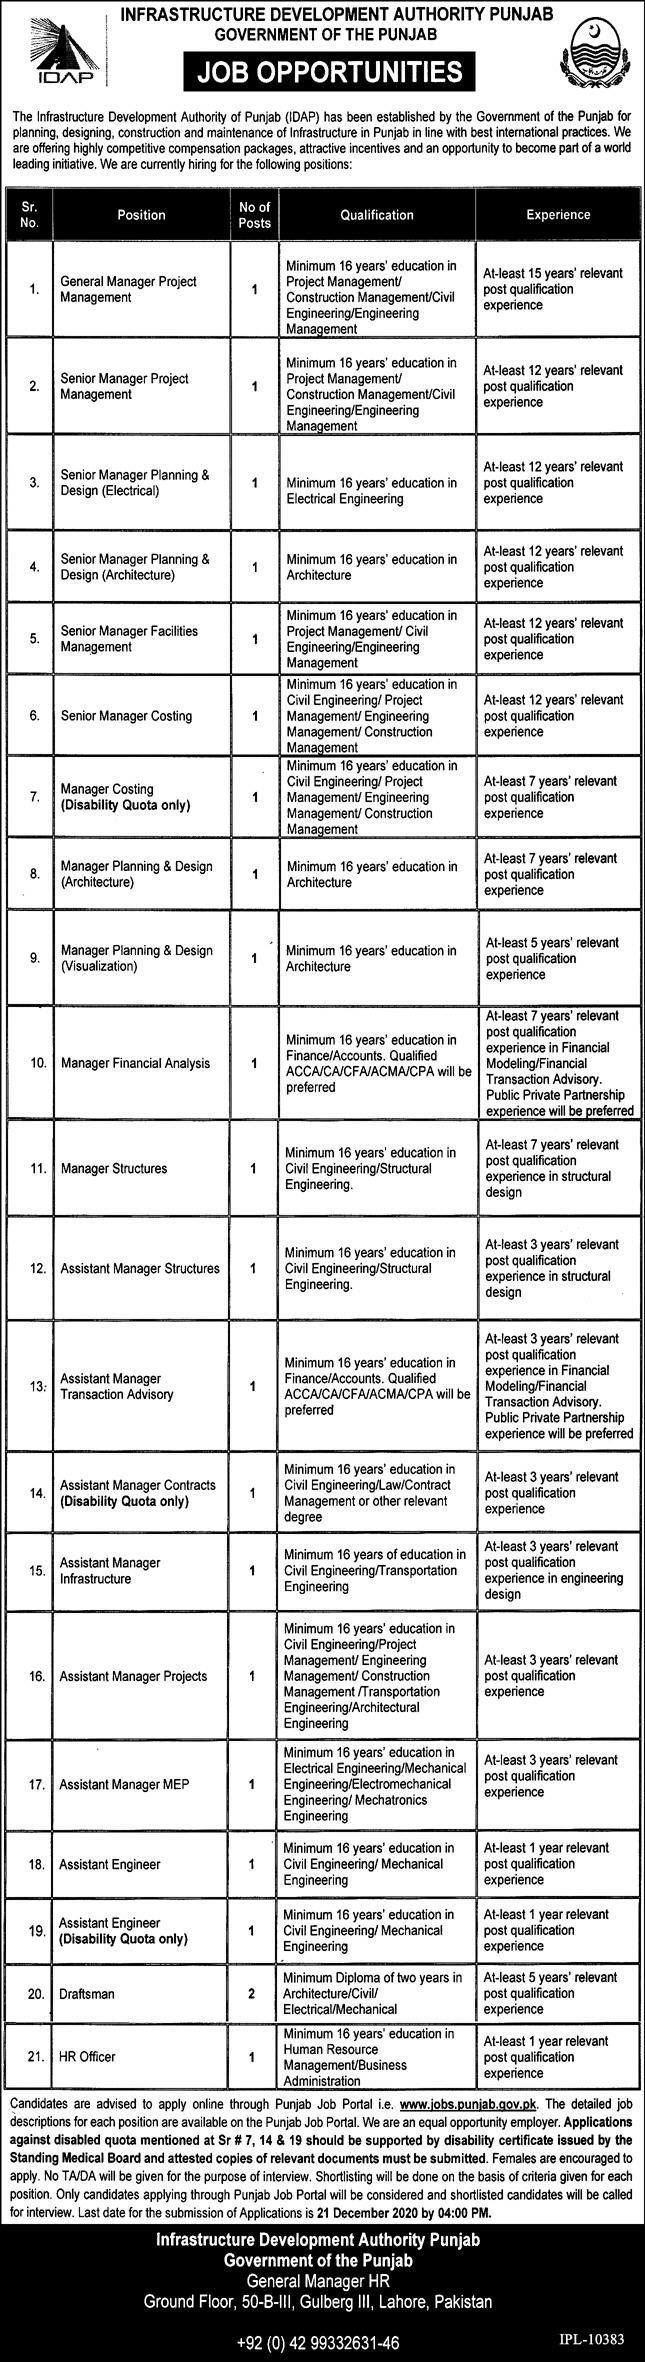 IDAP Jobs Infrastructure Development Authority Punjab IDAP Lahore - IDAP Pakistan - Download Application Form - www.jobs.punjab.gov.pk Jobs 2021